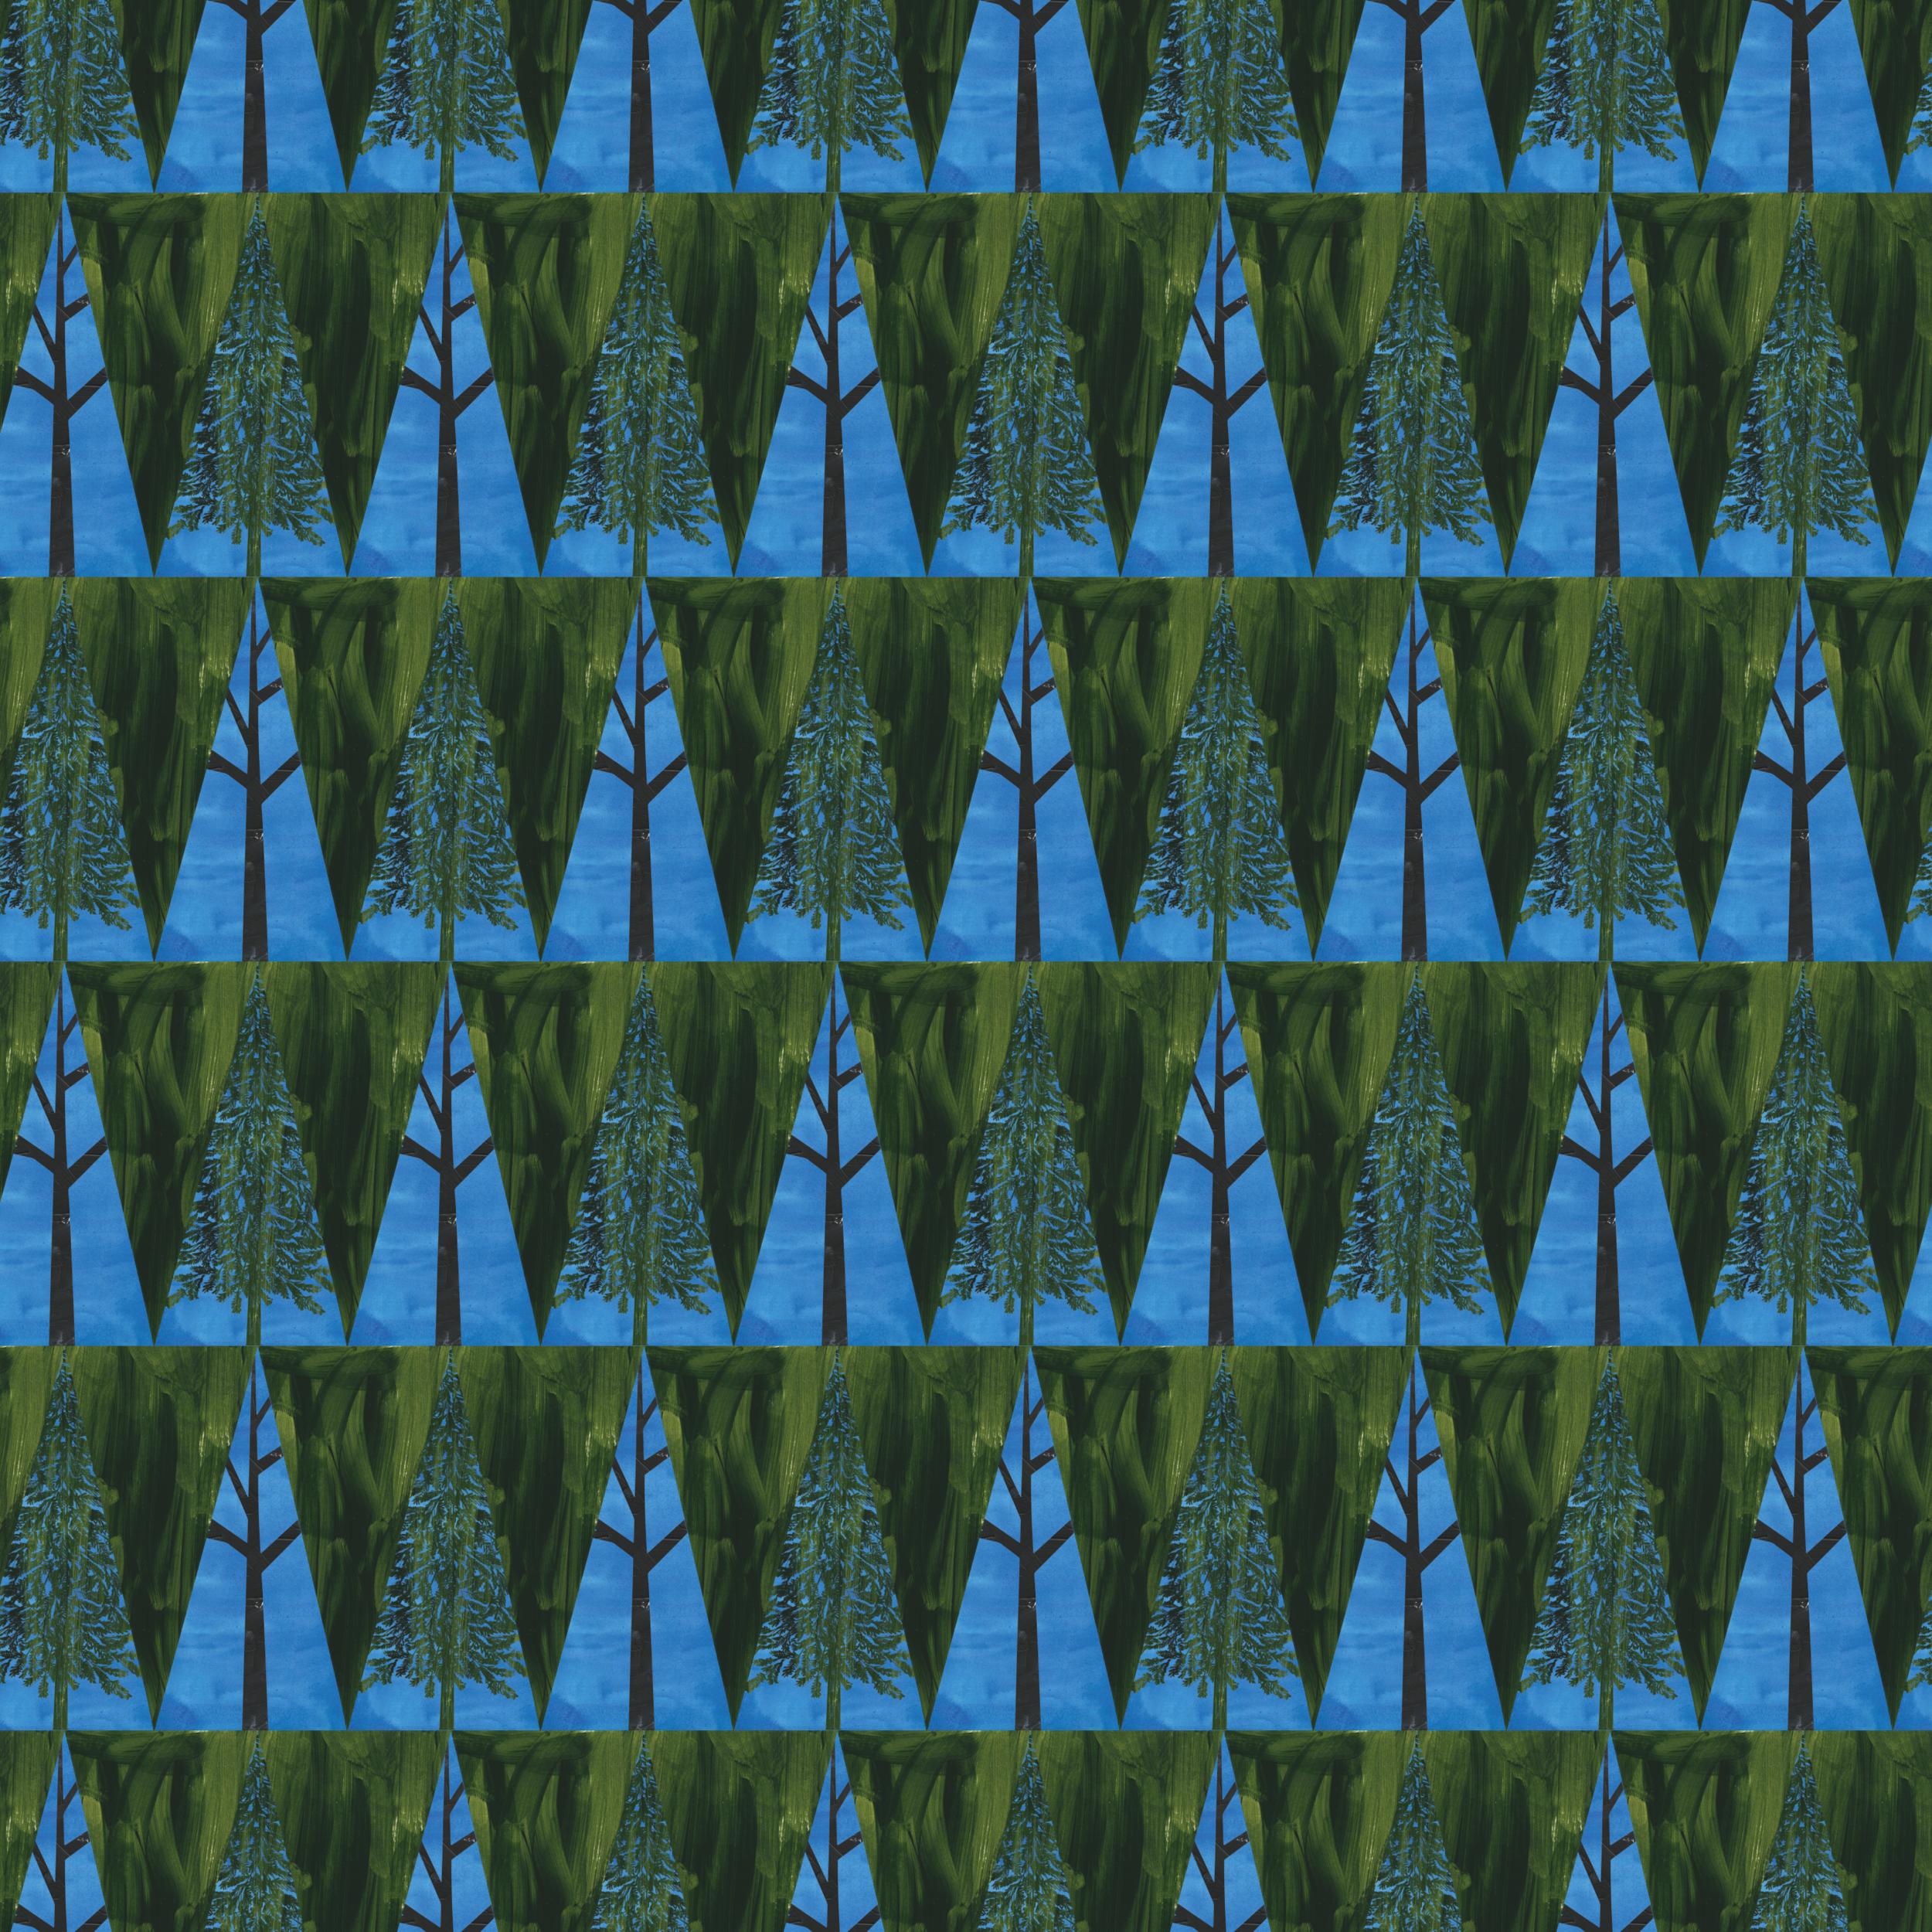 TreePine-01.png